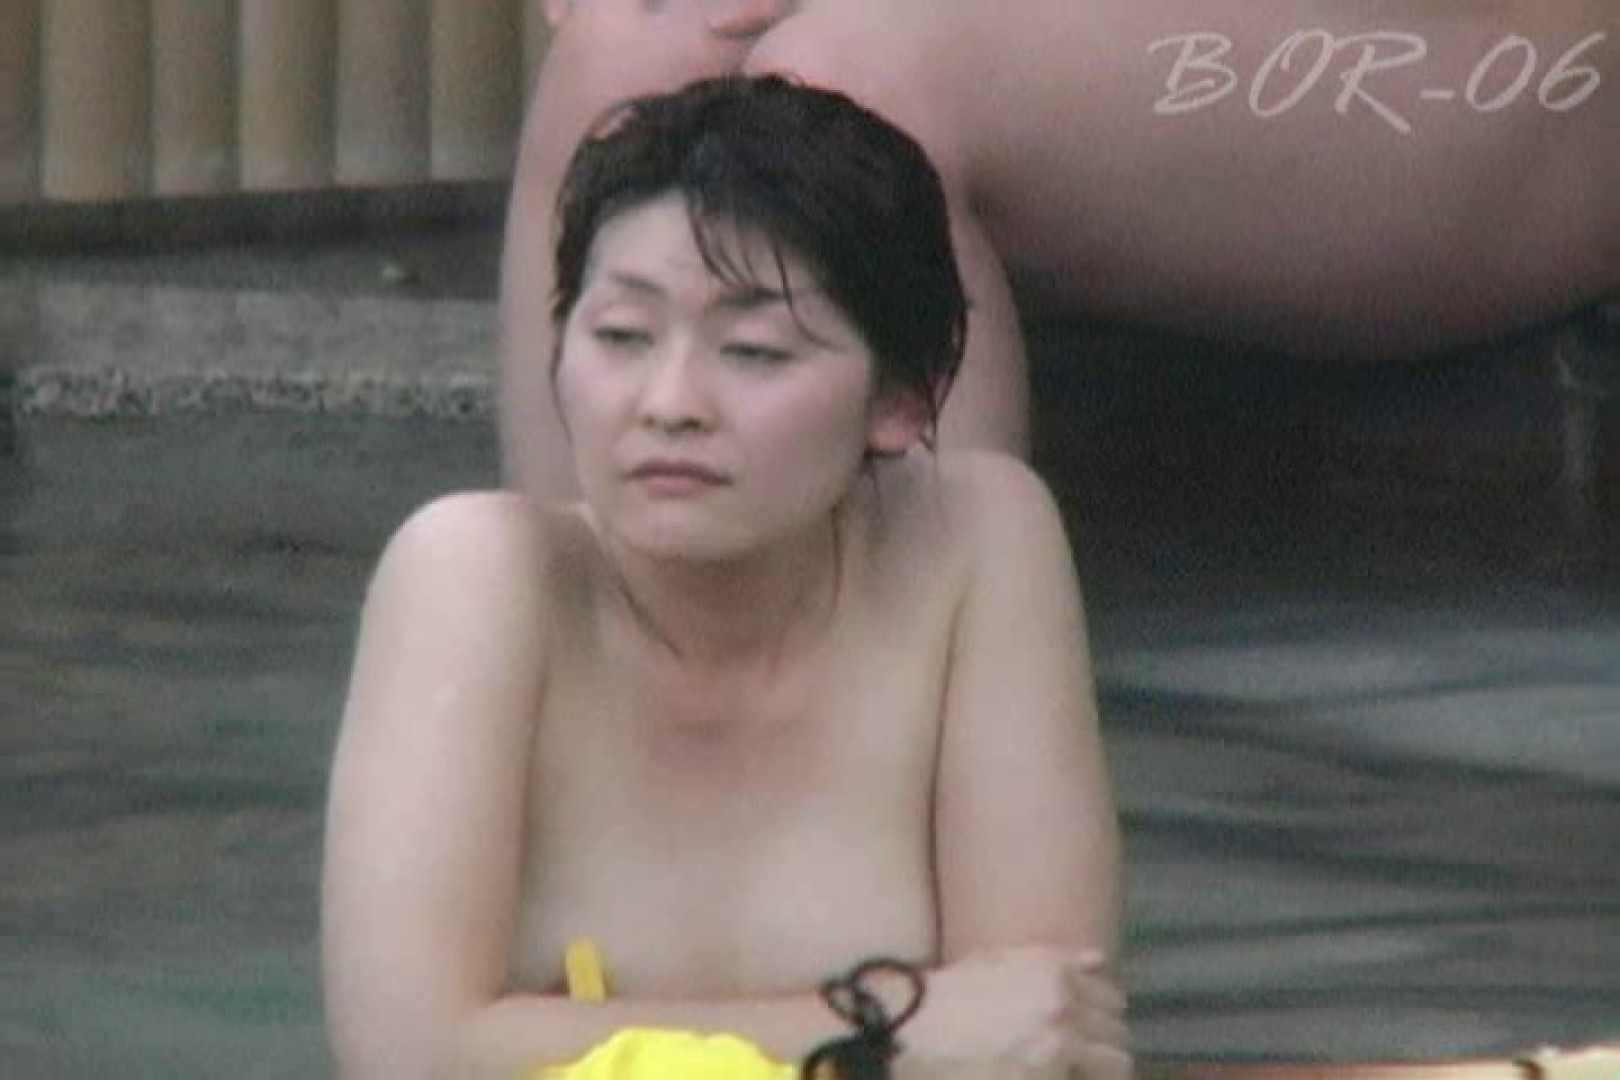 Aquaな露天風呂Vol.523 盗撮映像  93Pix 21